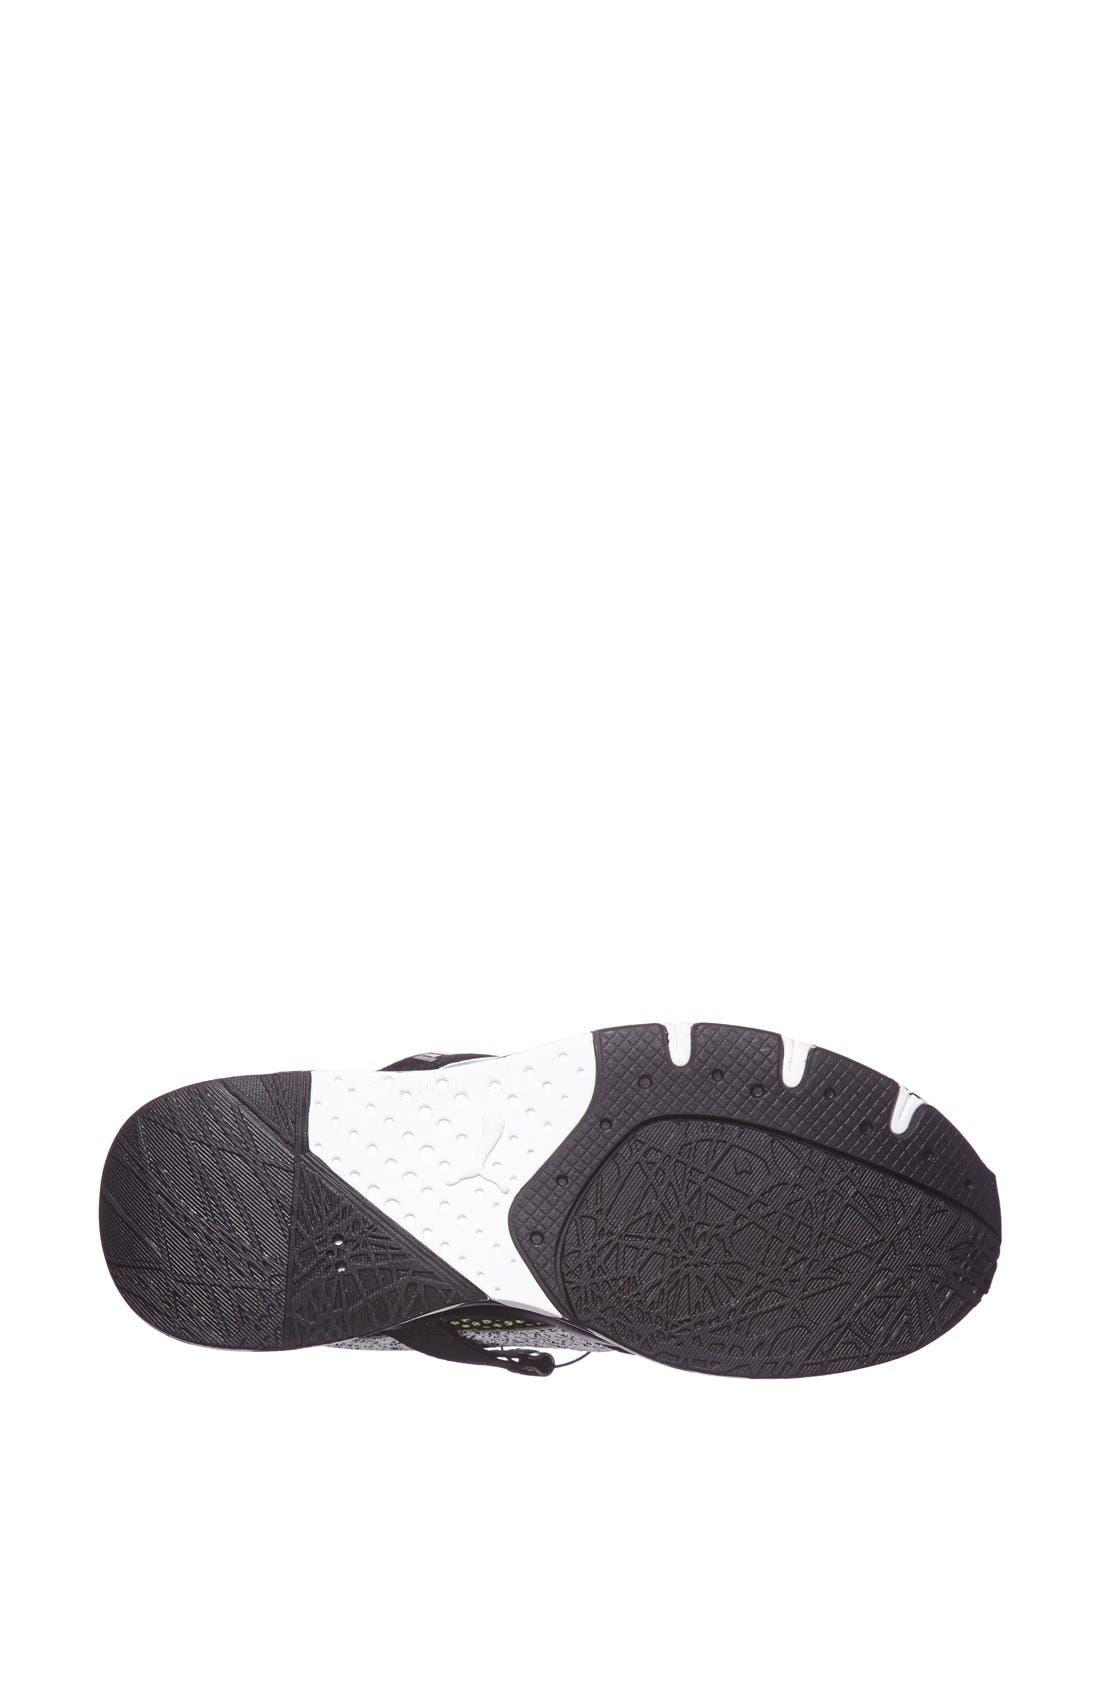 PUMA, 'Disc - Solange' Sneaker, Alternate thumbnail 2, color, 020